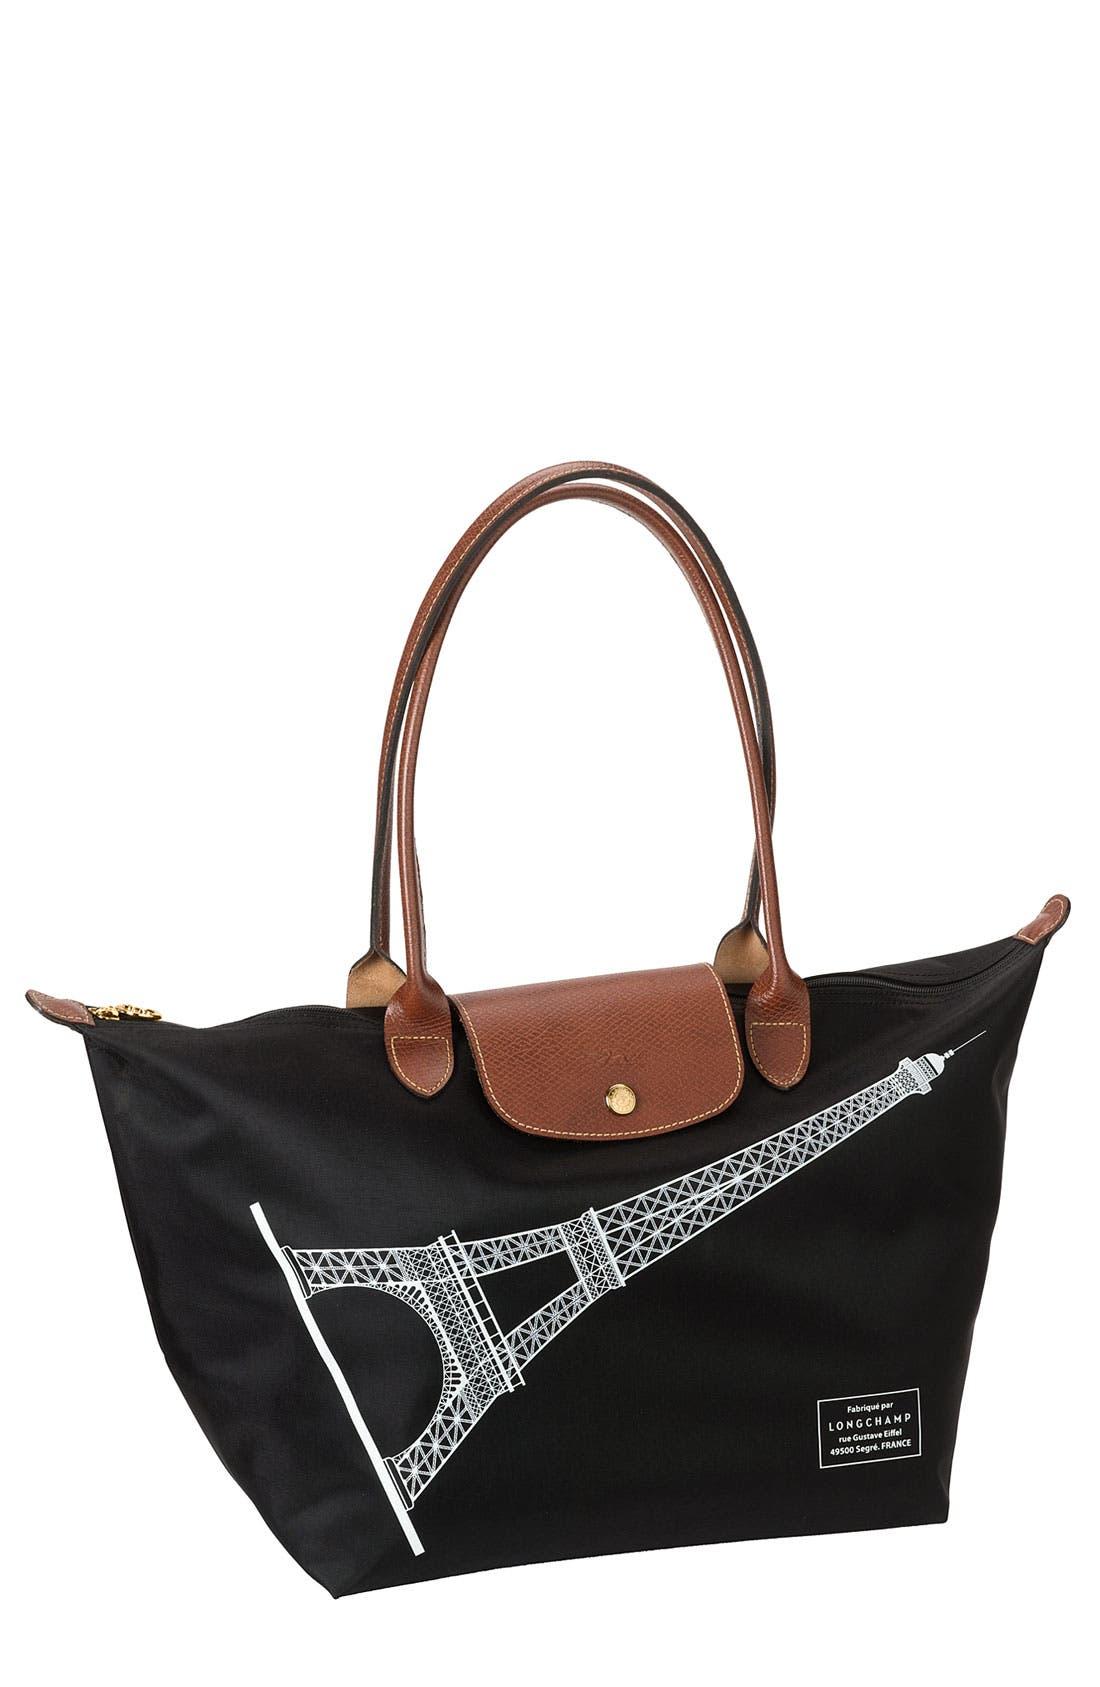 Alternate Image 1 Selected - Longchamp 'Pliage Tour - Eiffel' Tote